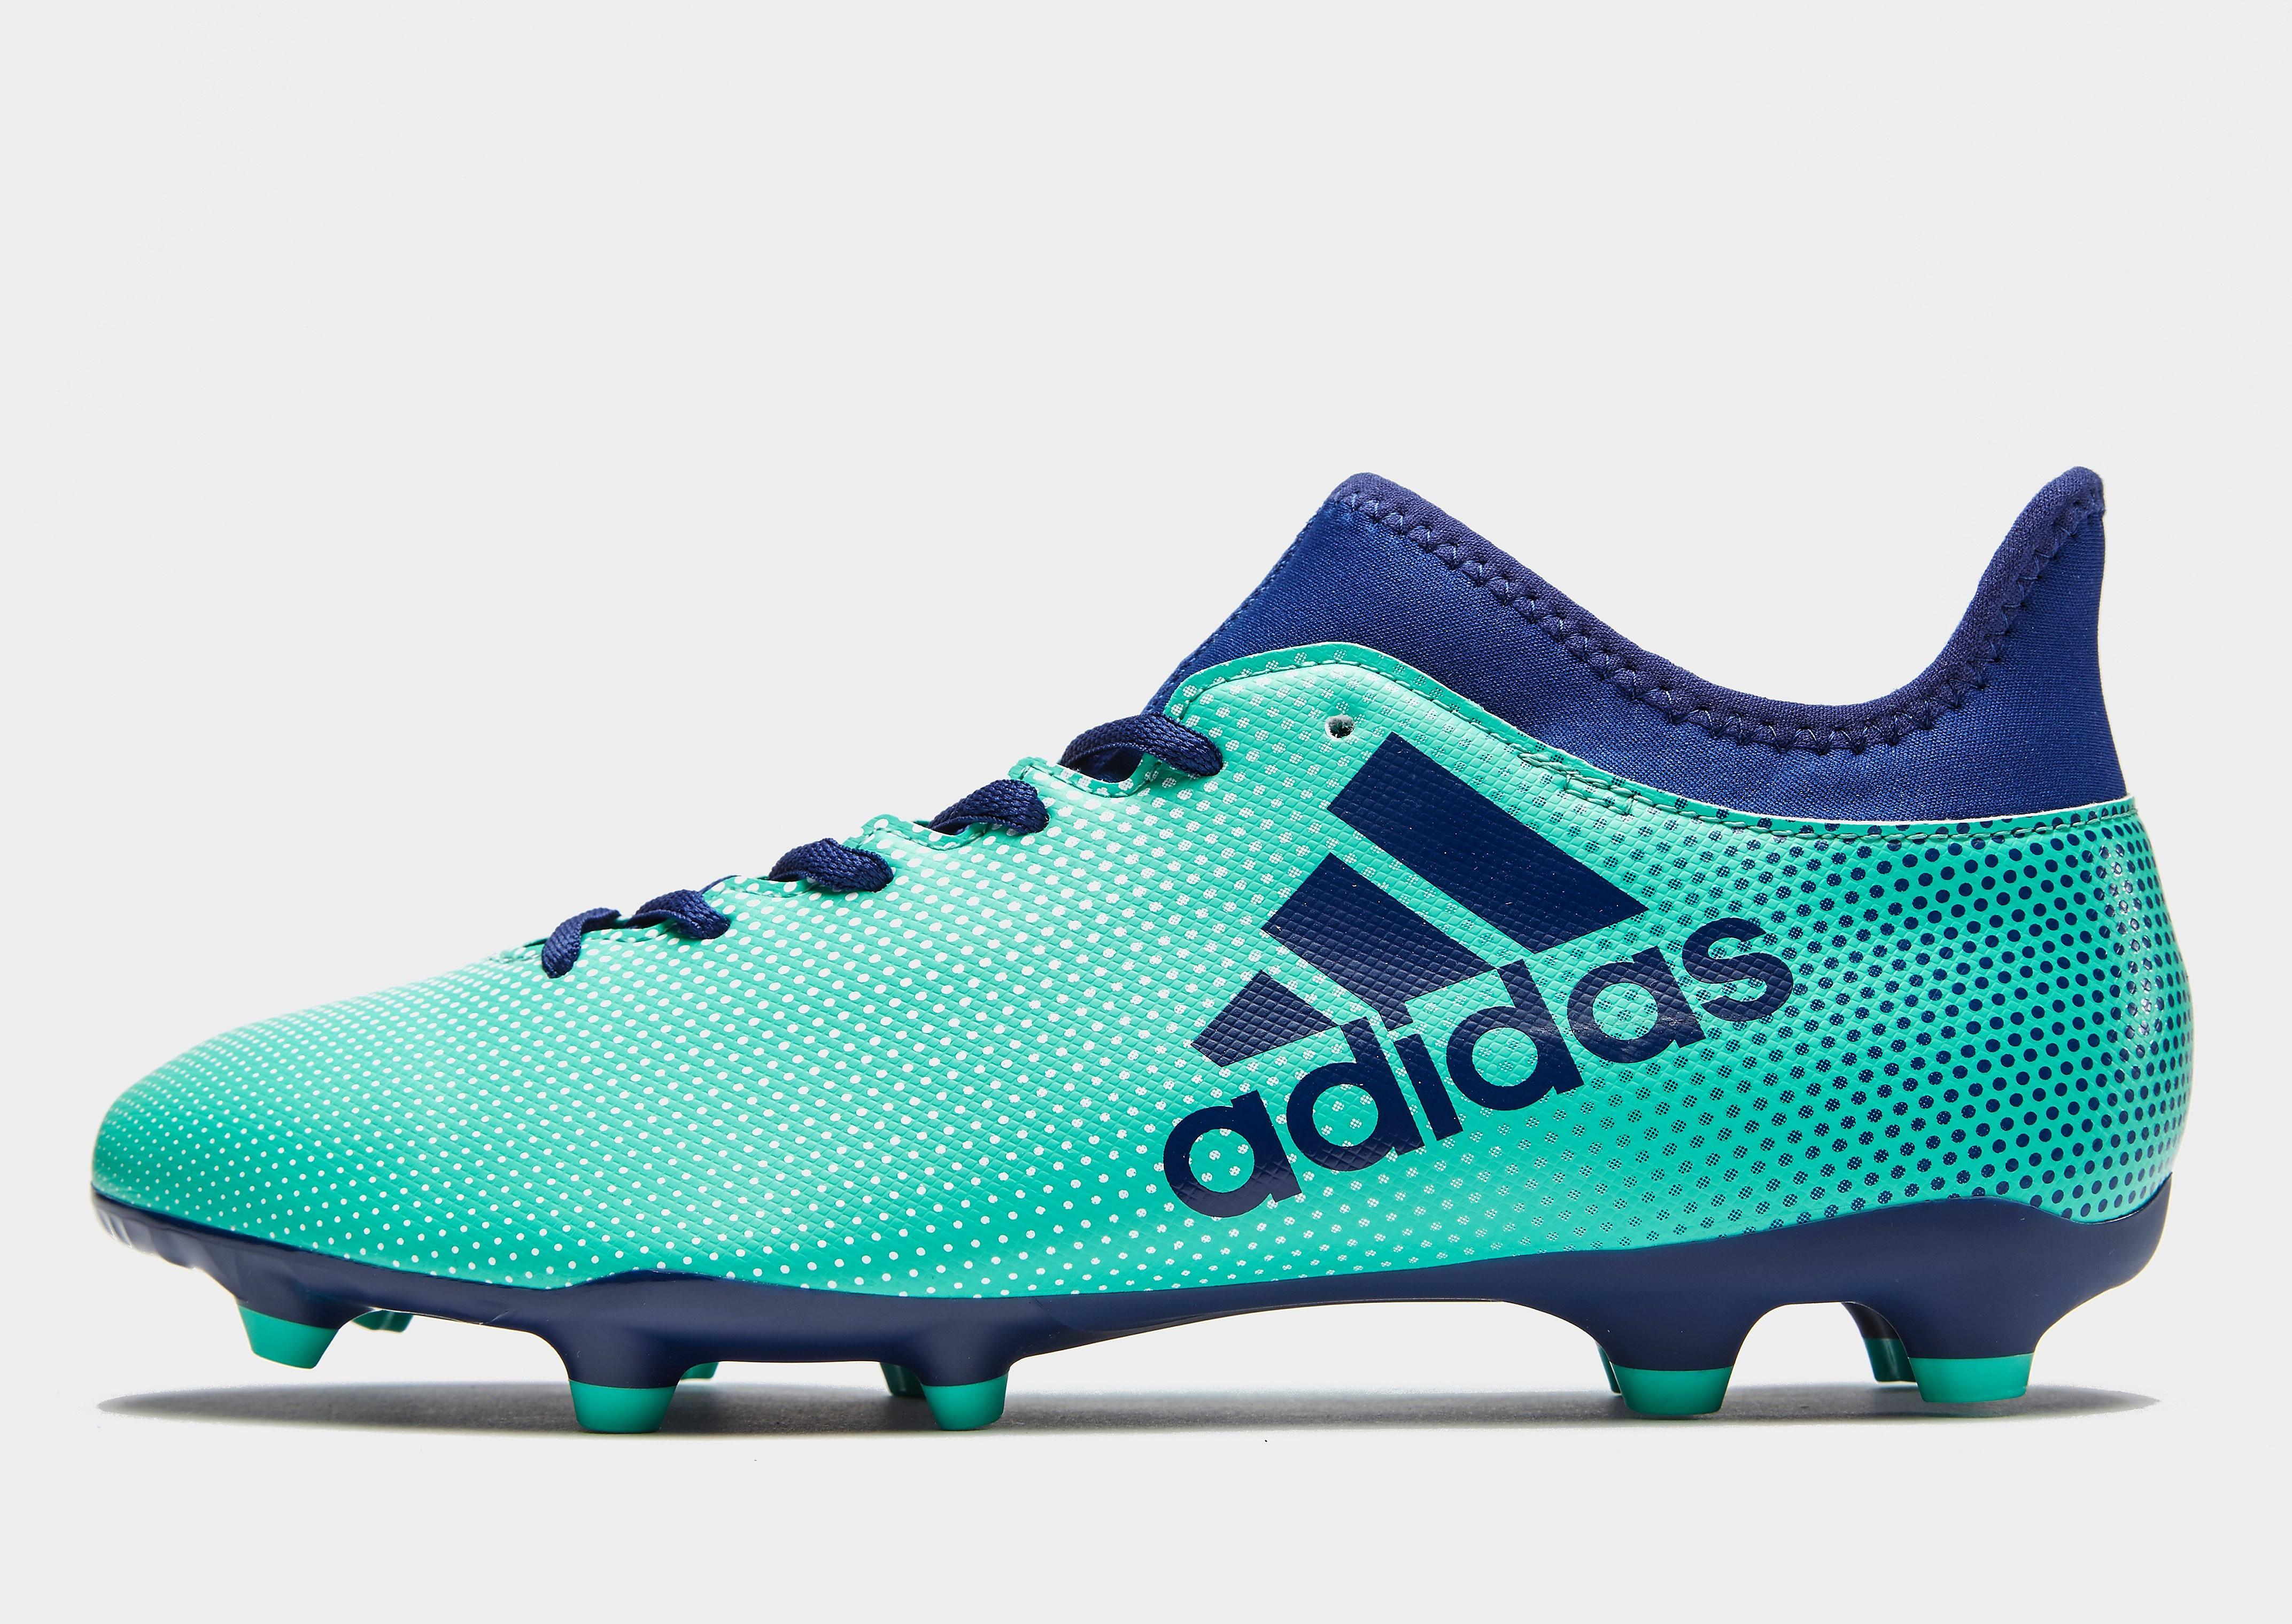 adidas Deadly Strike X 17.3 FG (RESERVA)